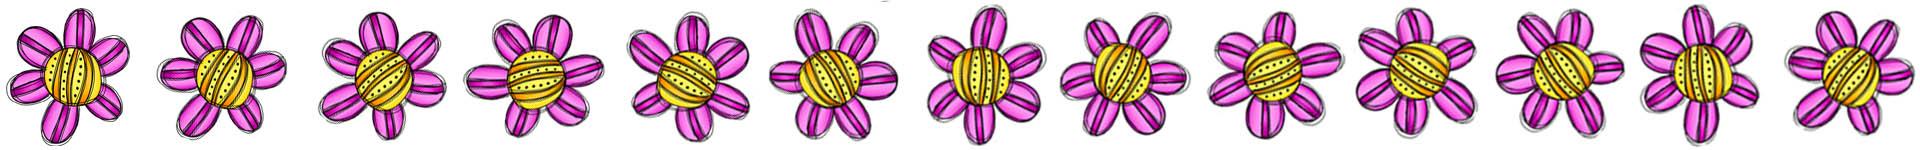 Image: Tiny Flower Border